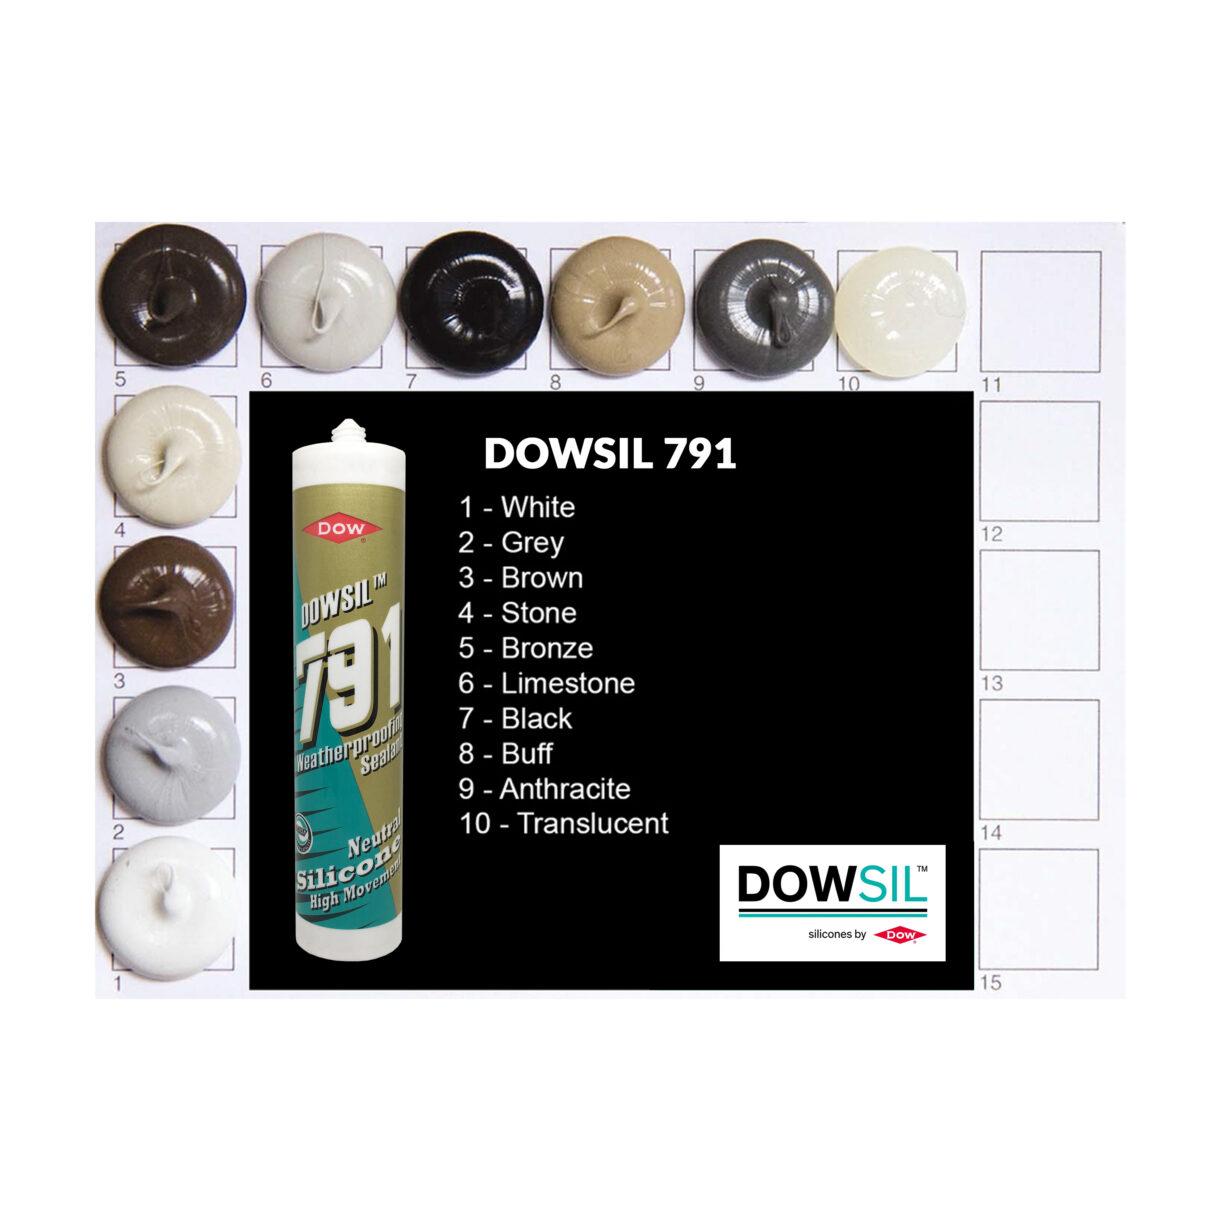 DOWSIL 791